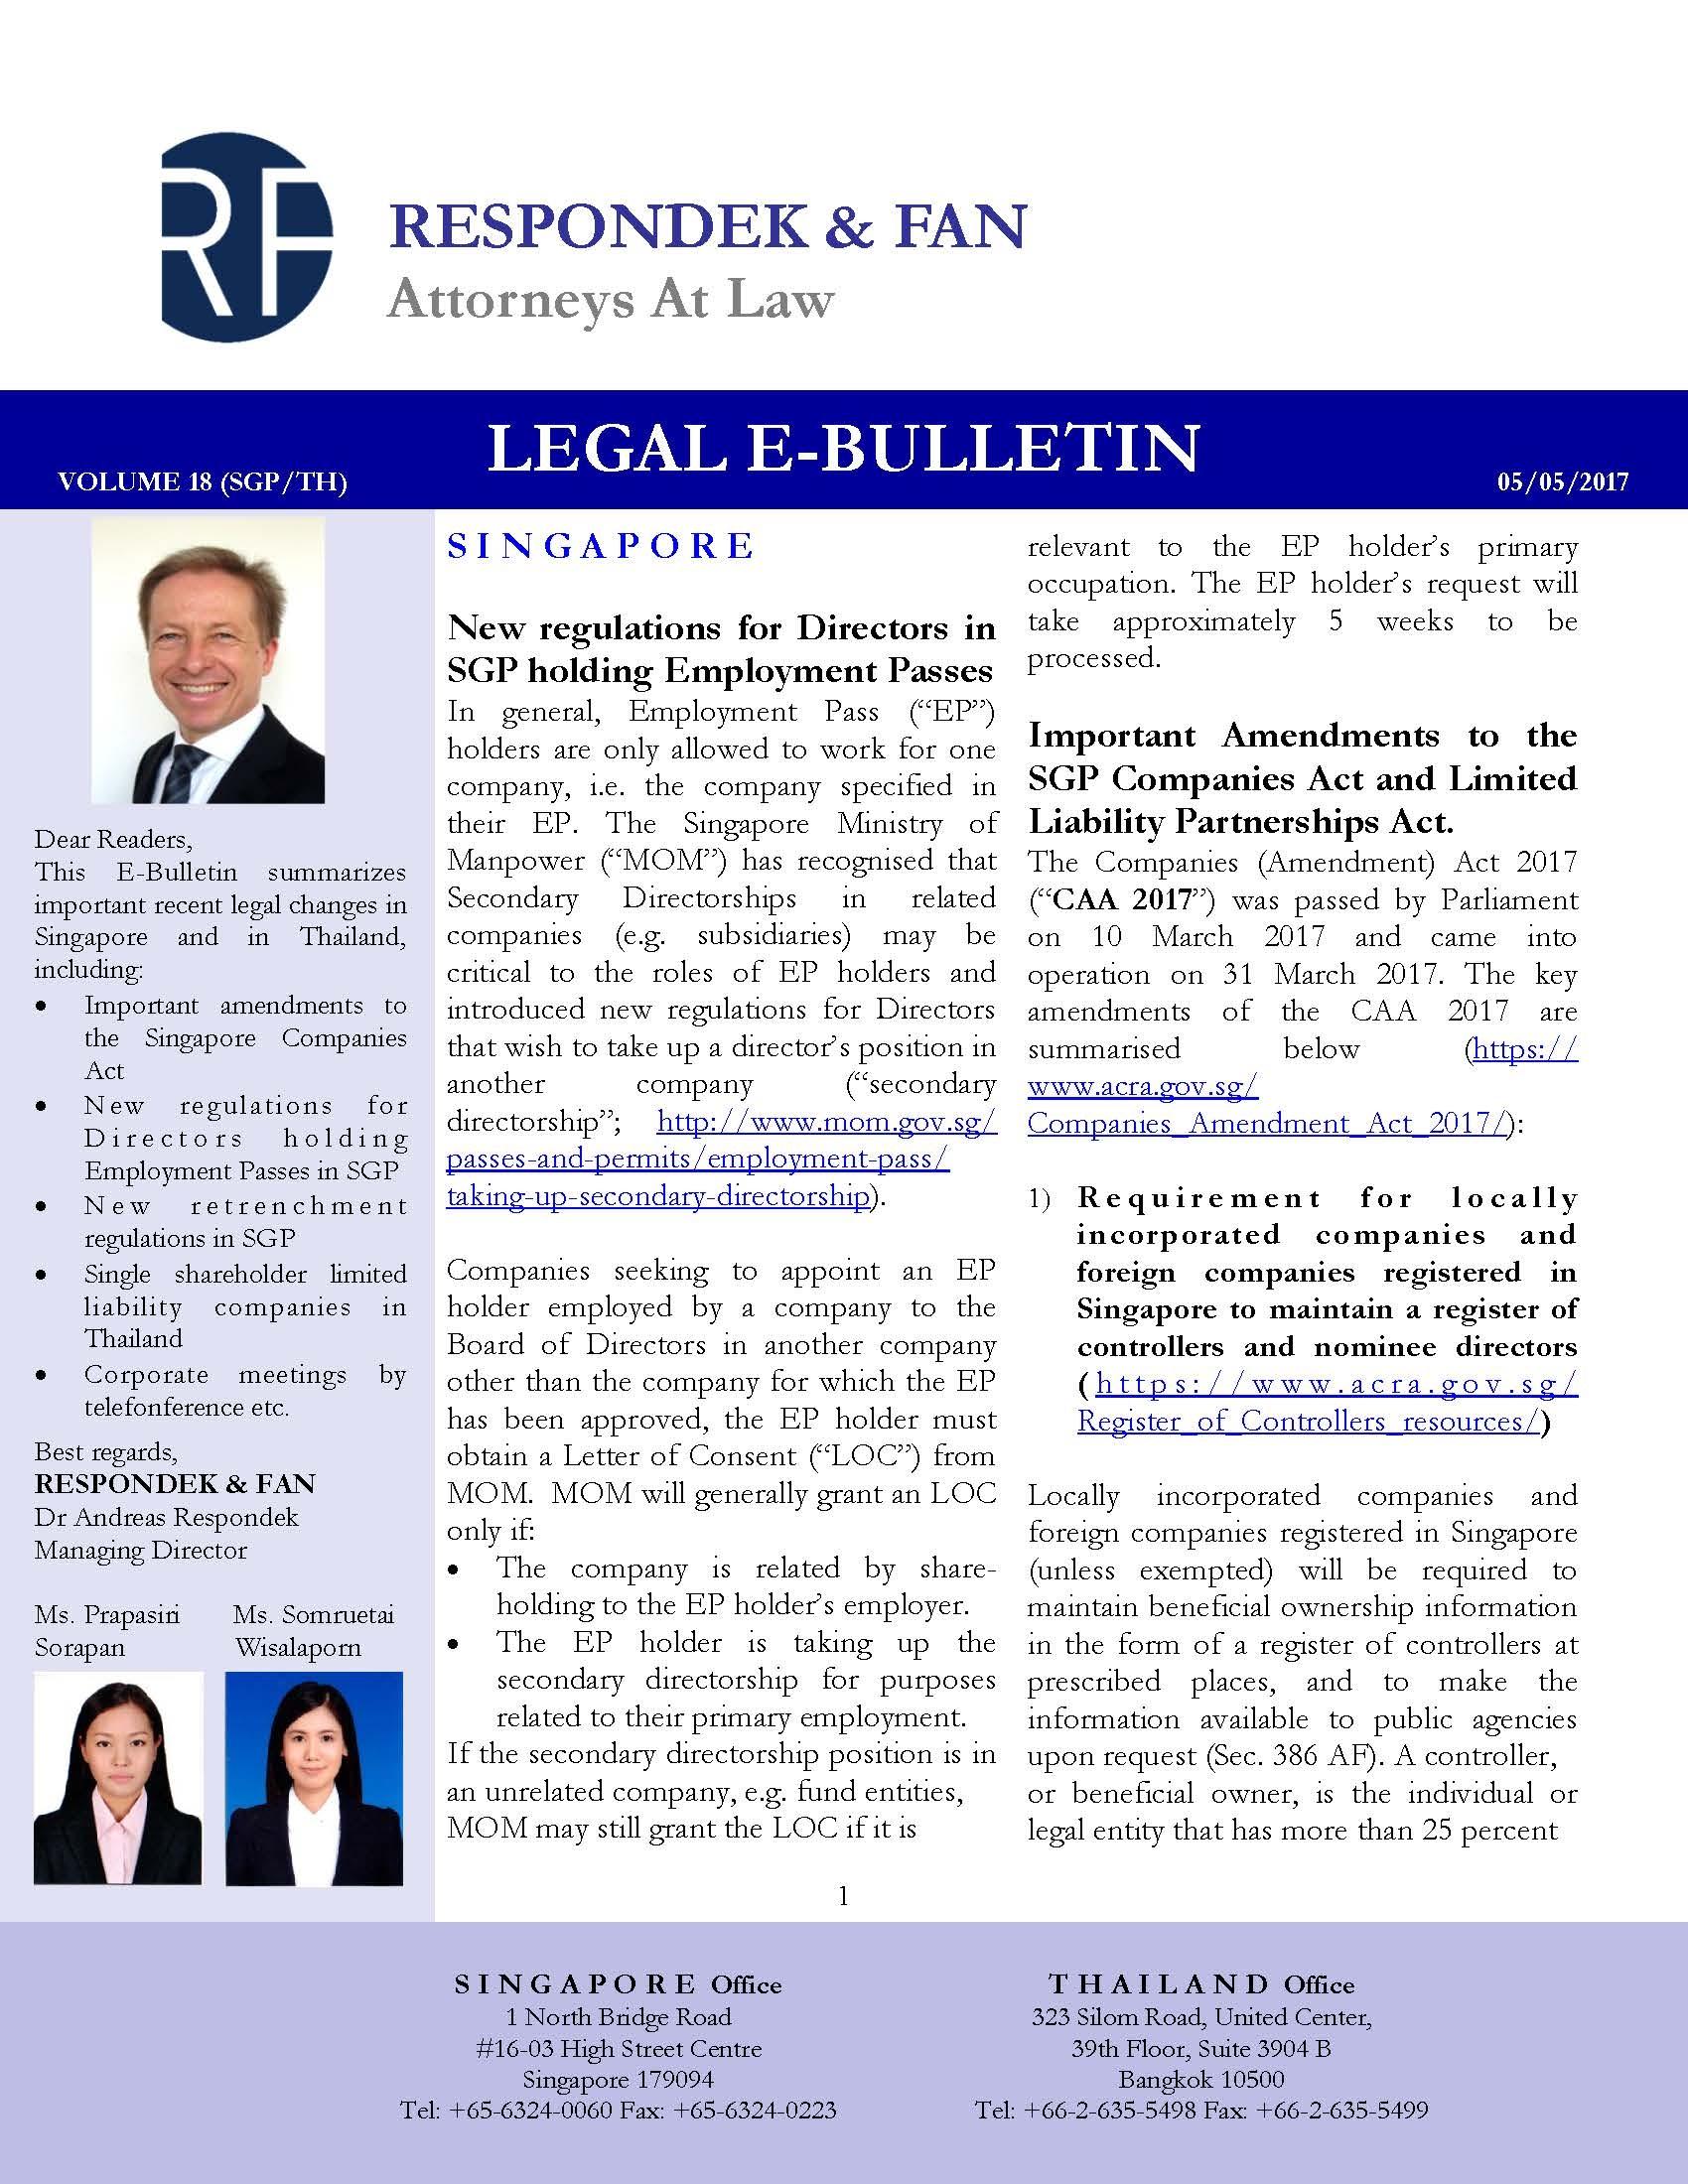 E-Bulletins - PUBLICATIONS - Respondek & Fan